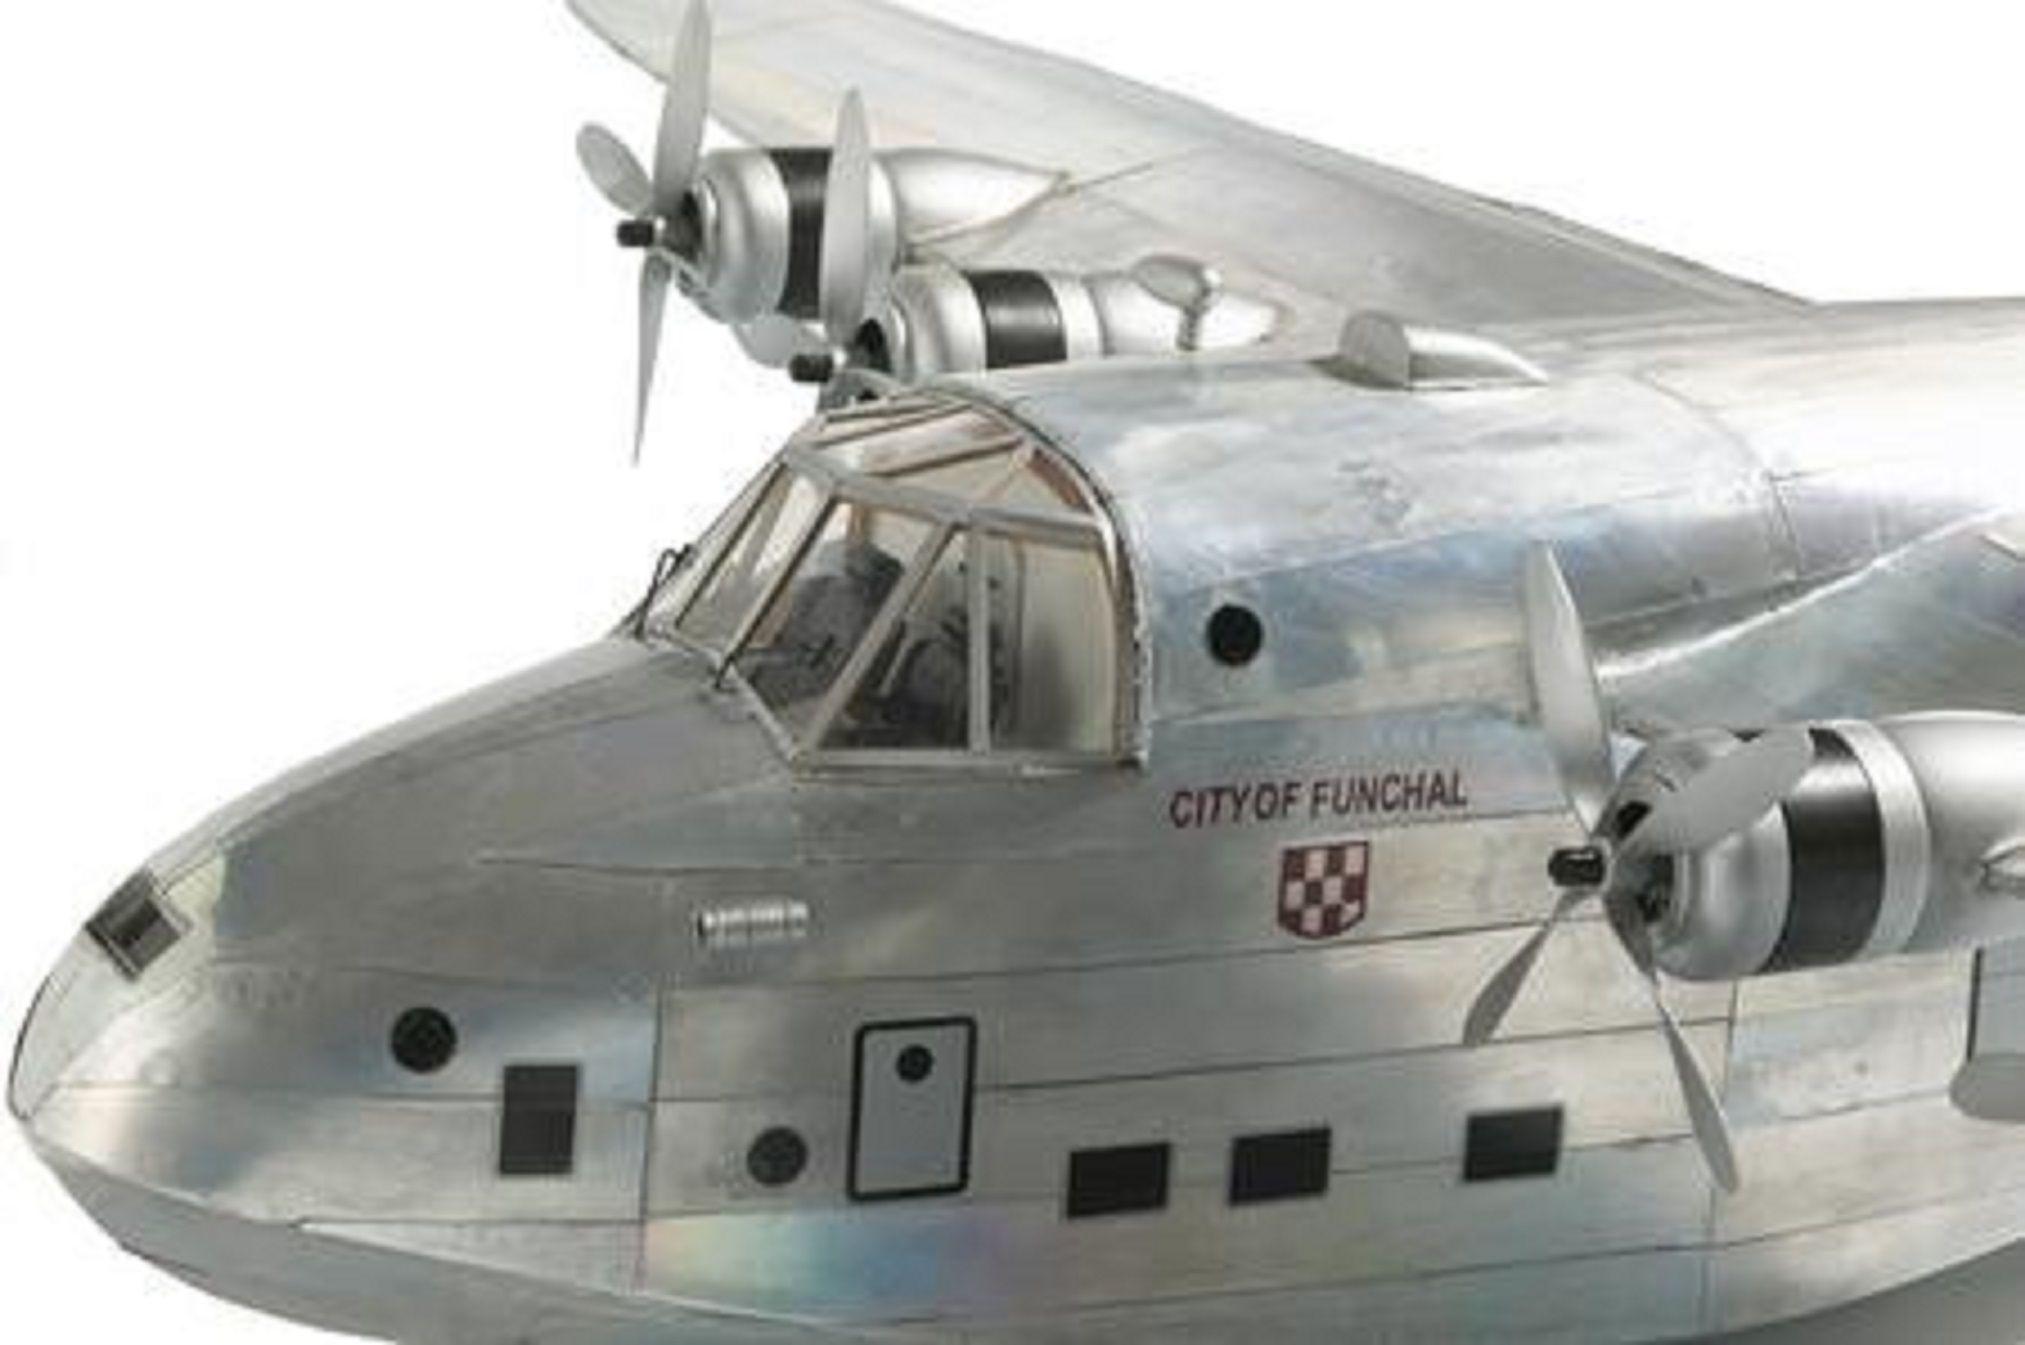 213-6887-Aquila-Airways-Model-Plane-Premier-Range